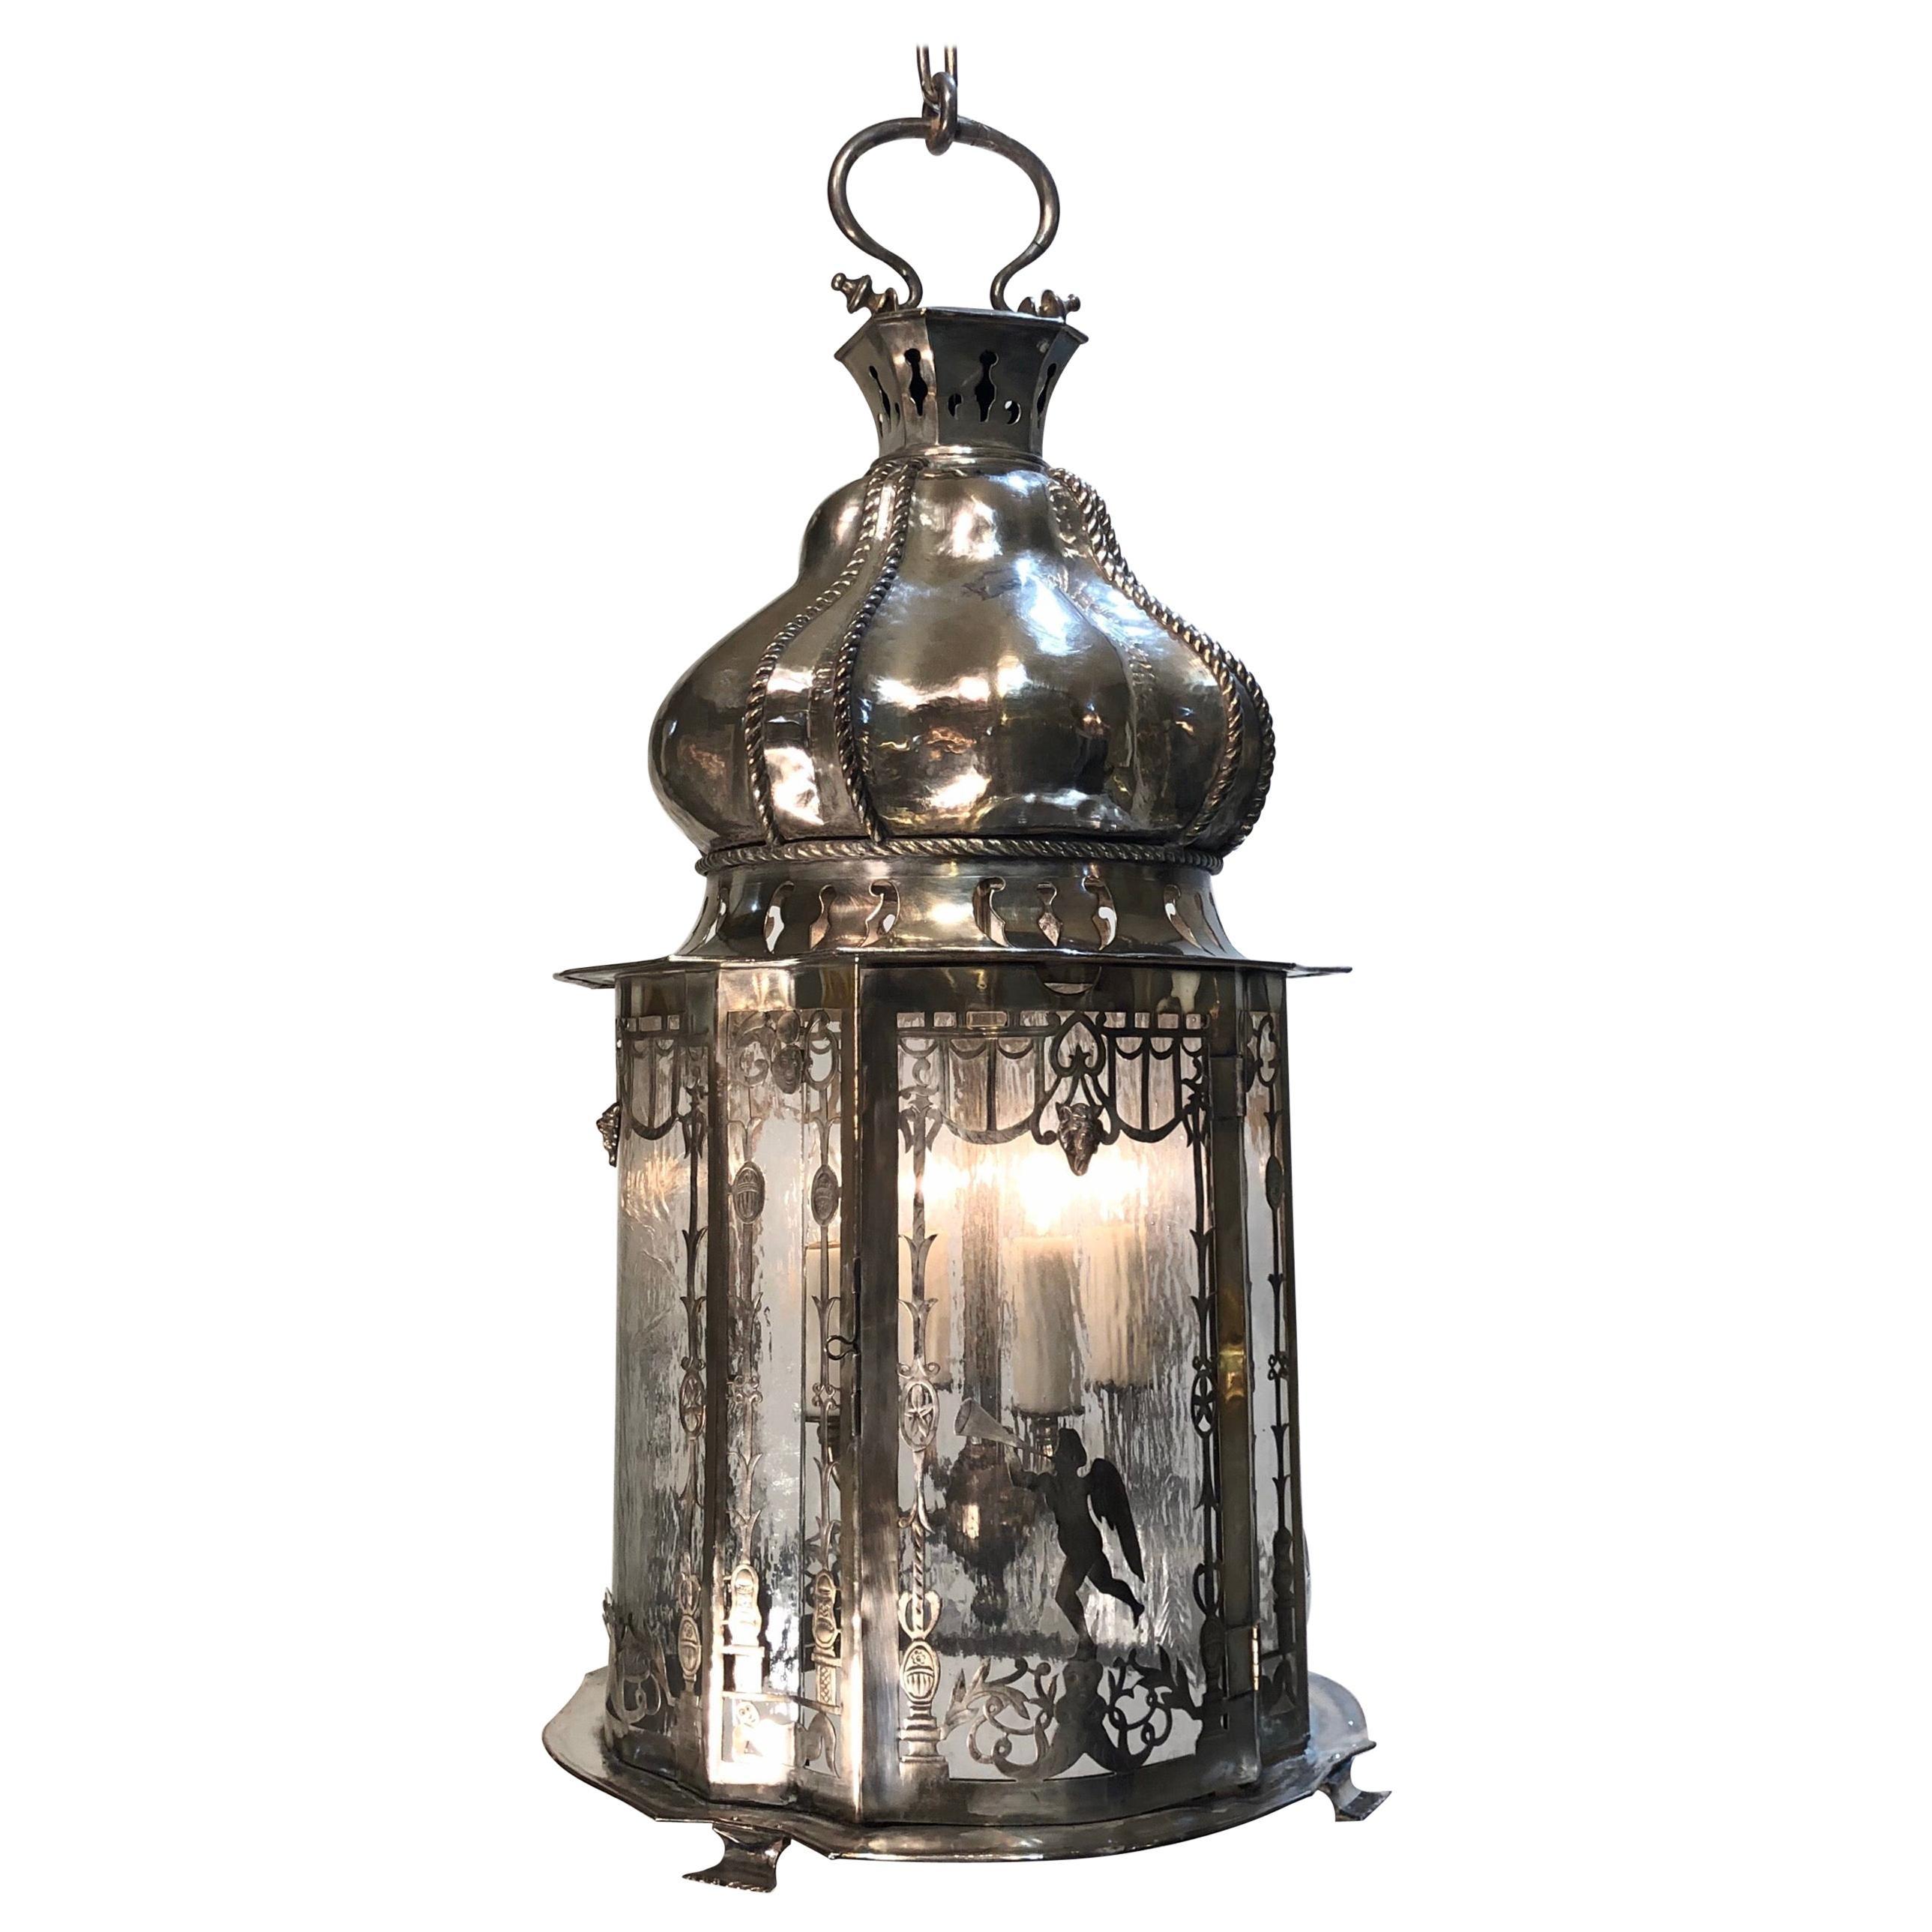 Silverplated Caldwell Lantern